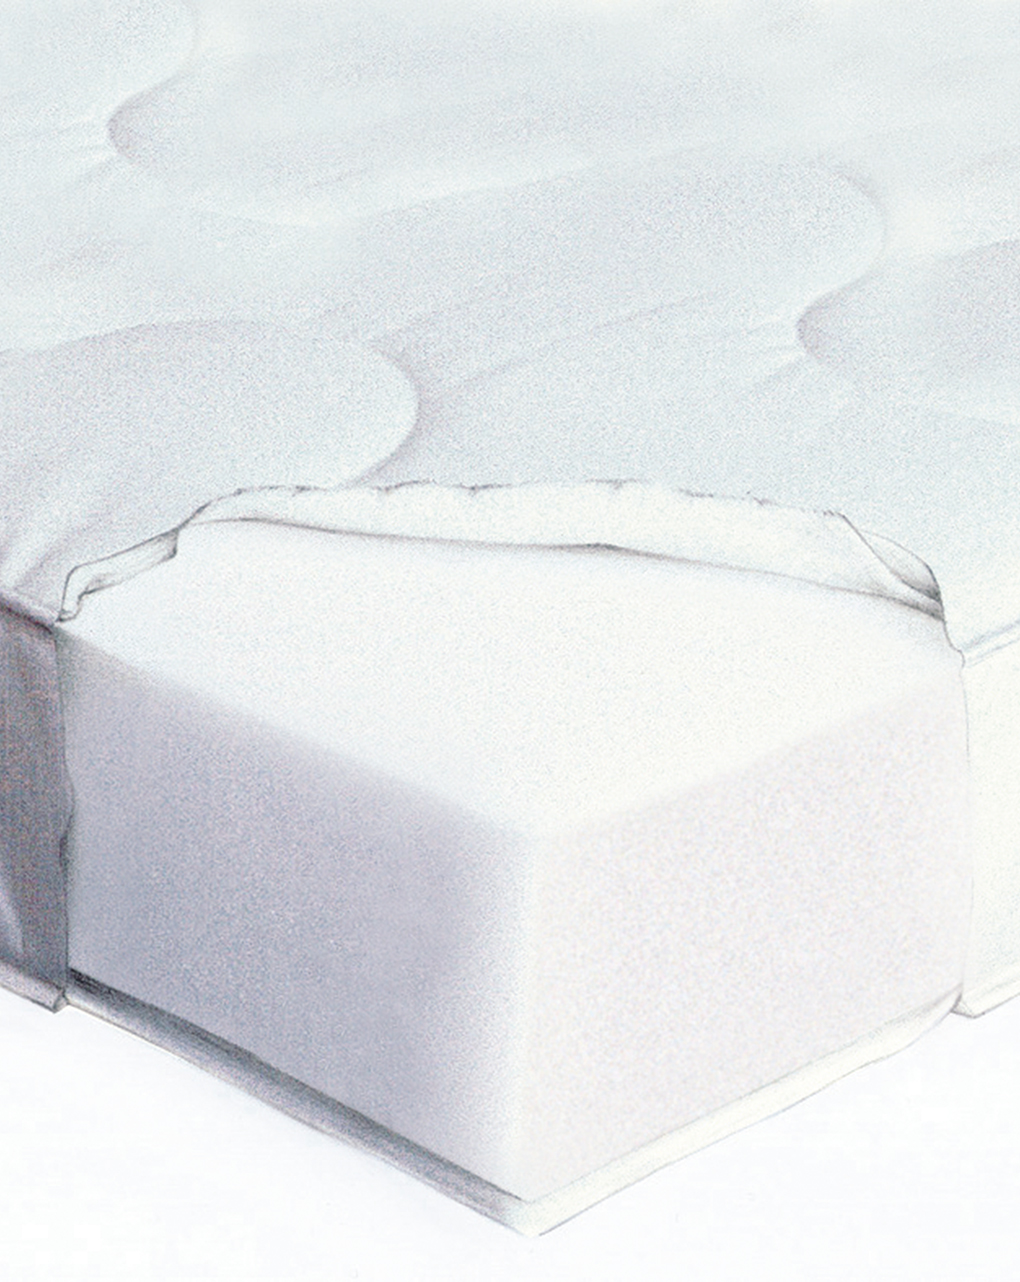 Materasso antiacaro non sfoderabile - Giordani